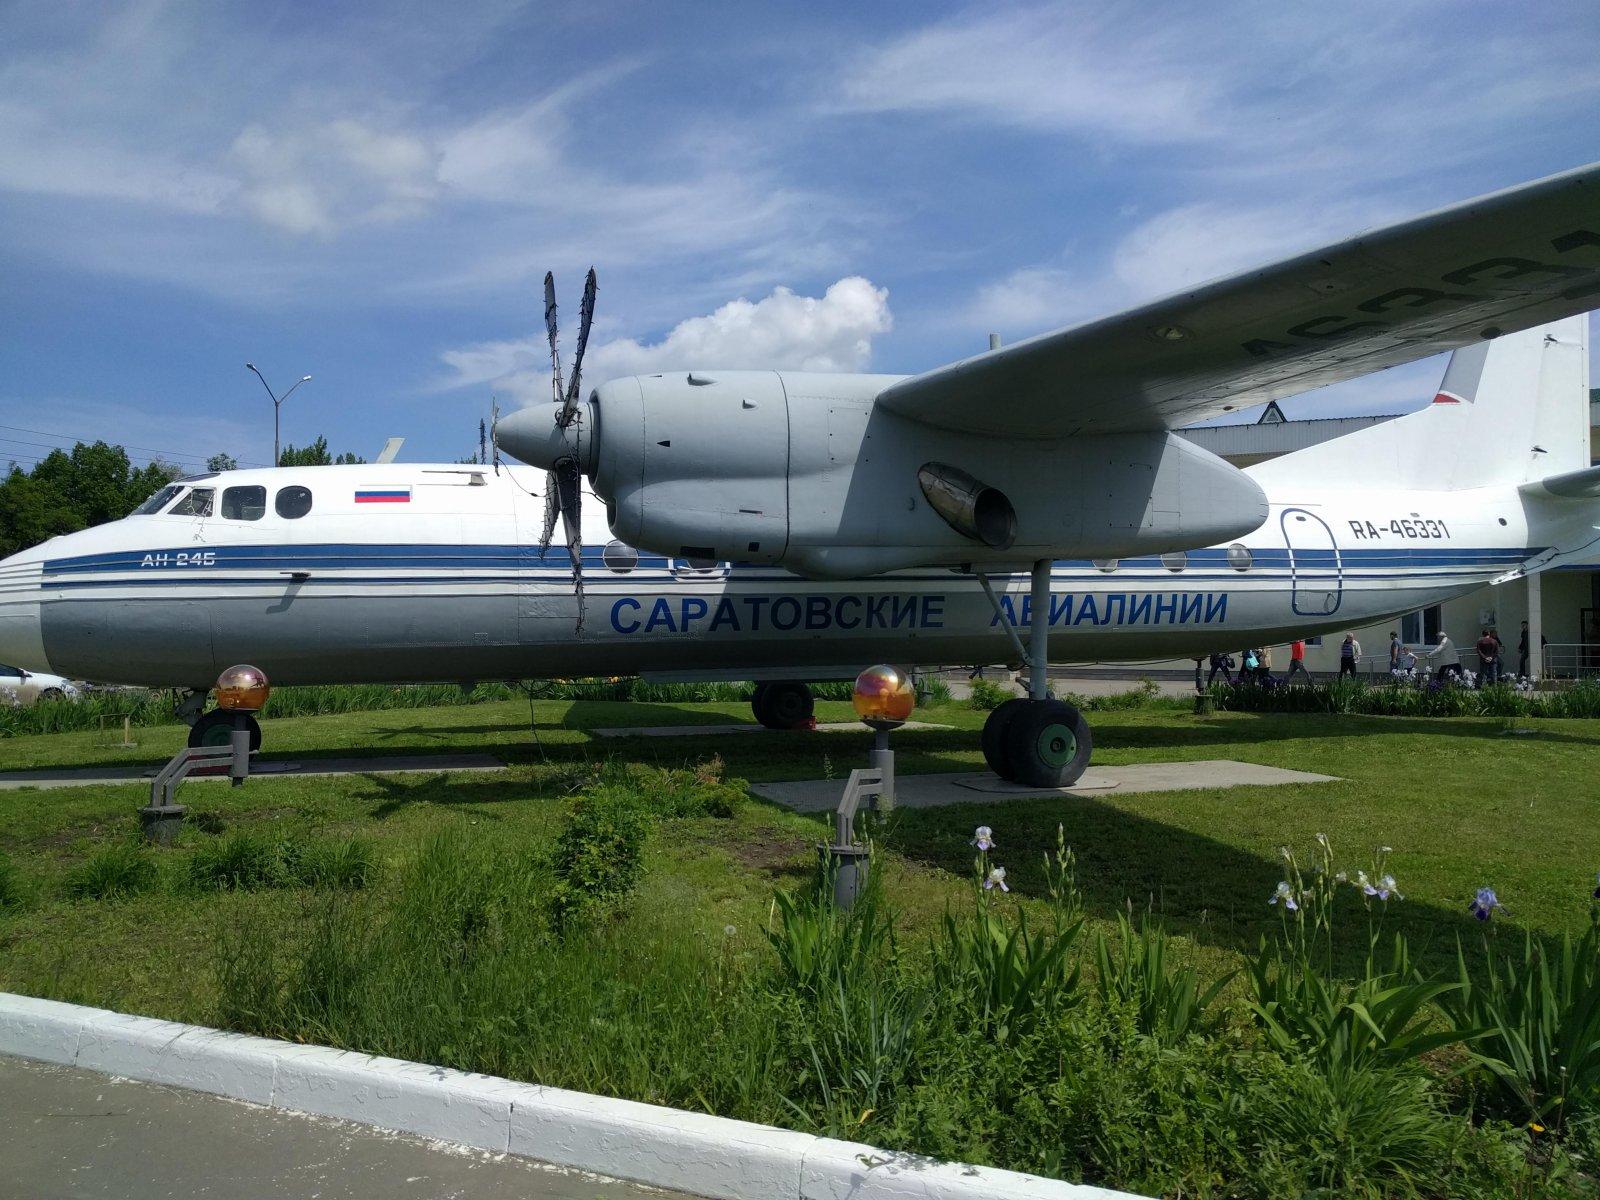 Самолет-памятник Ан-24